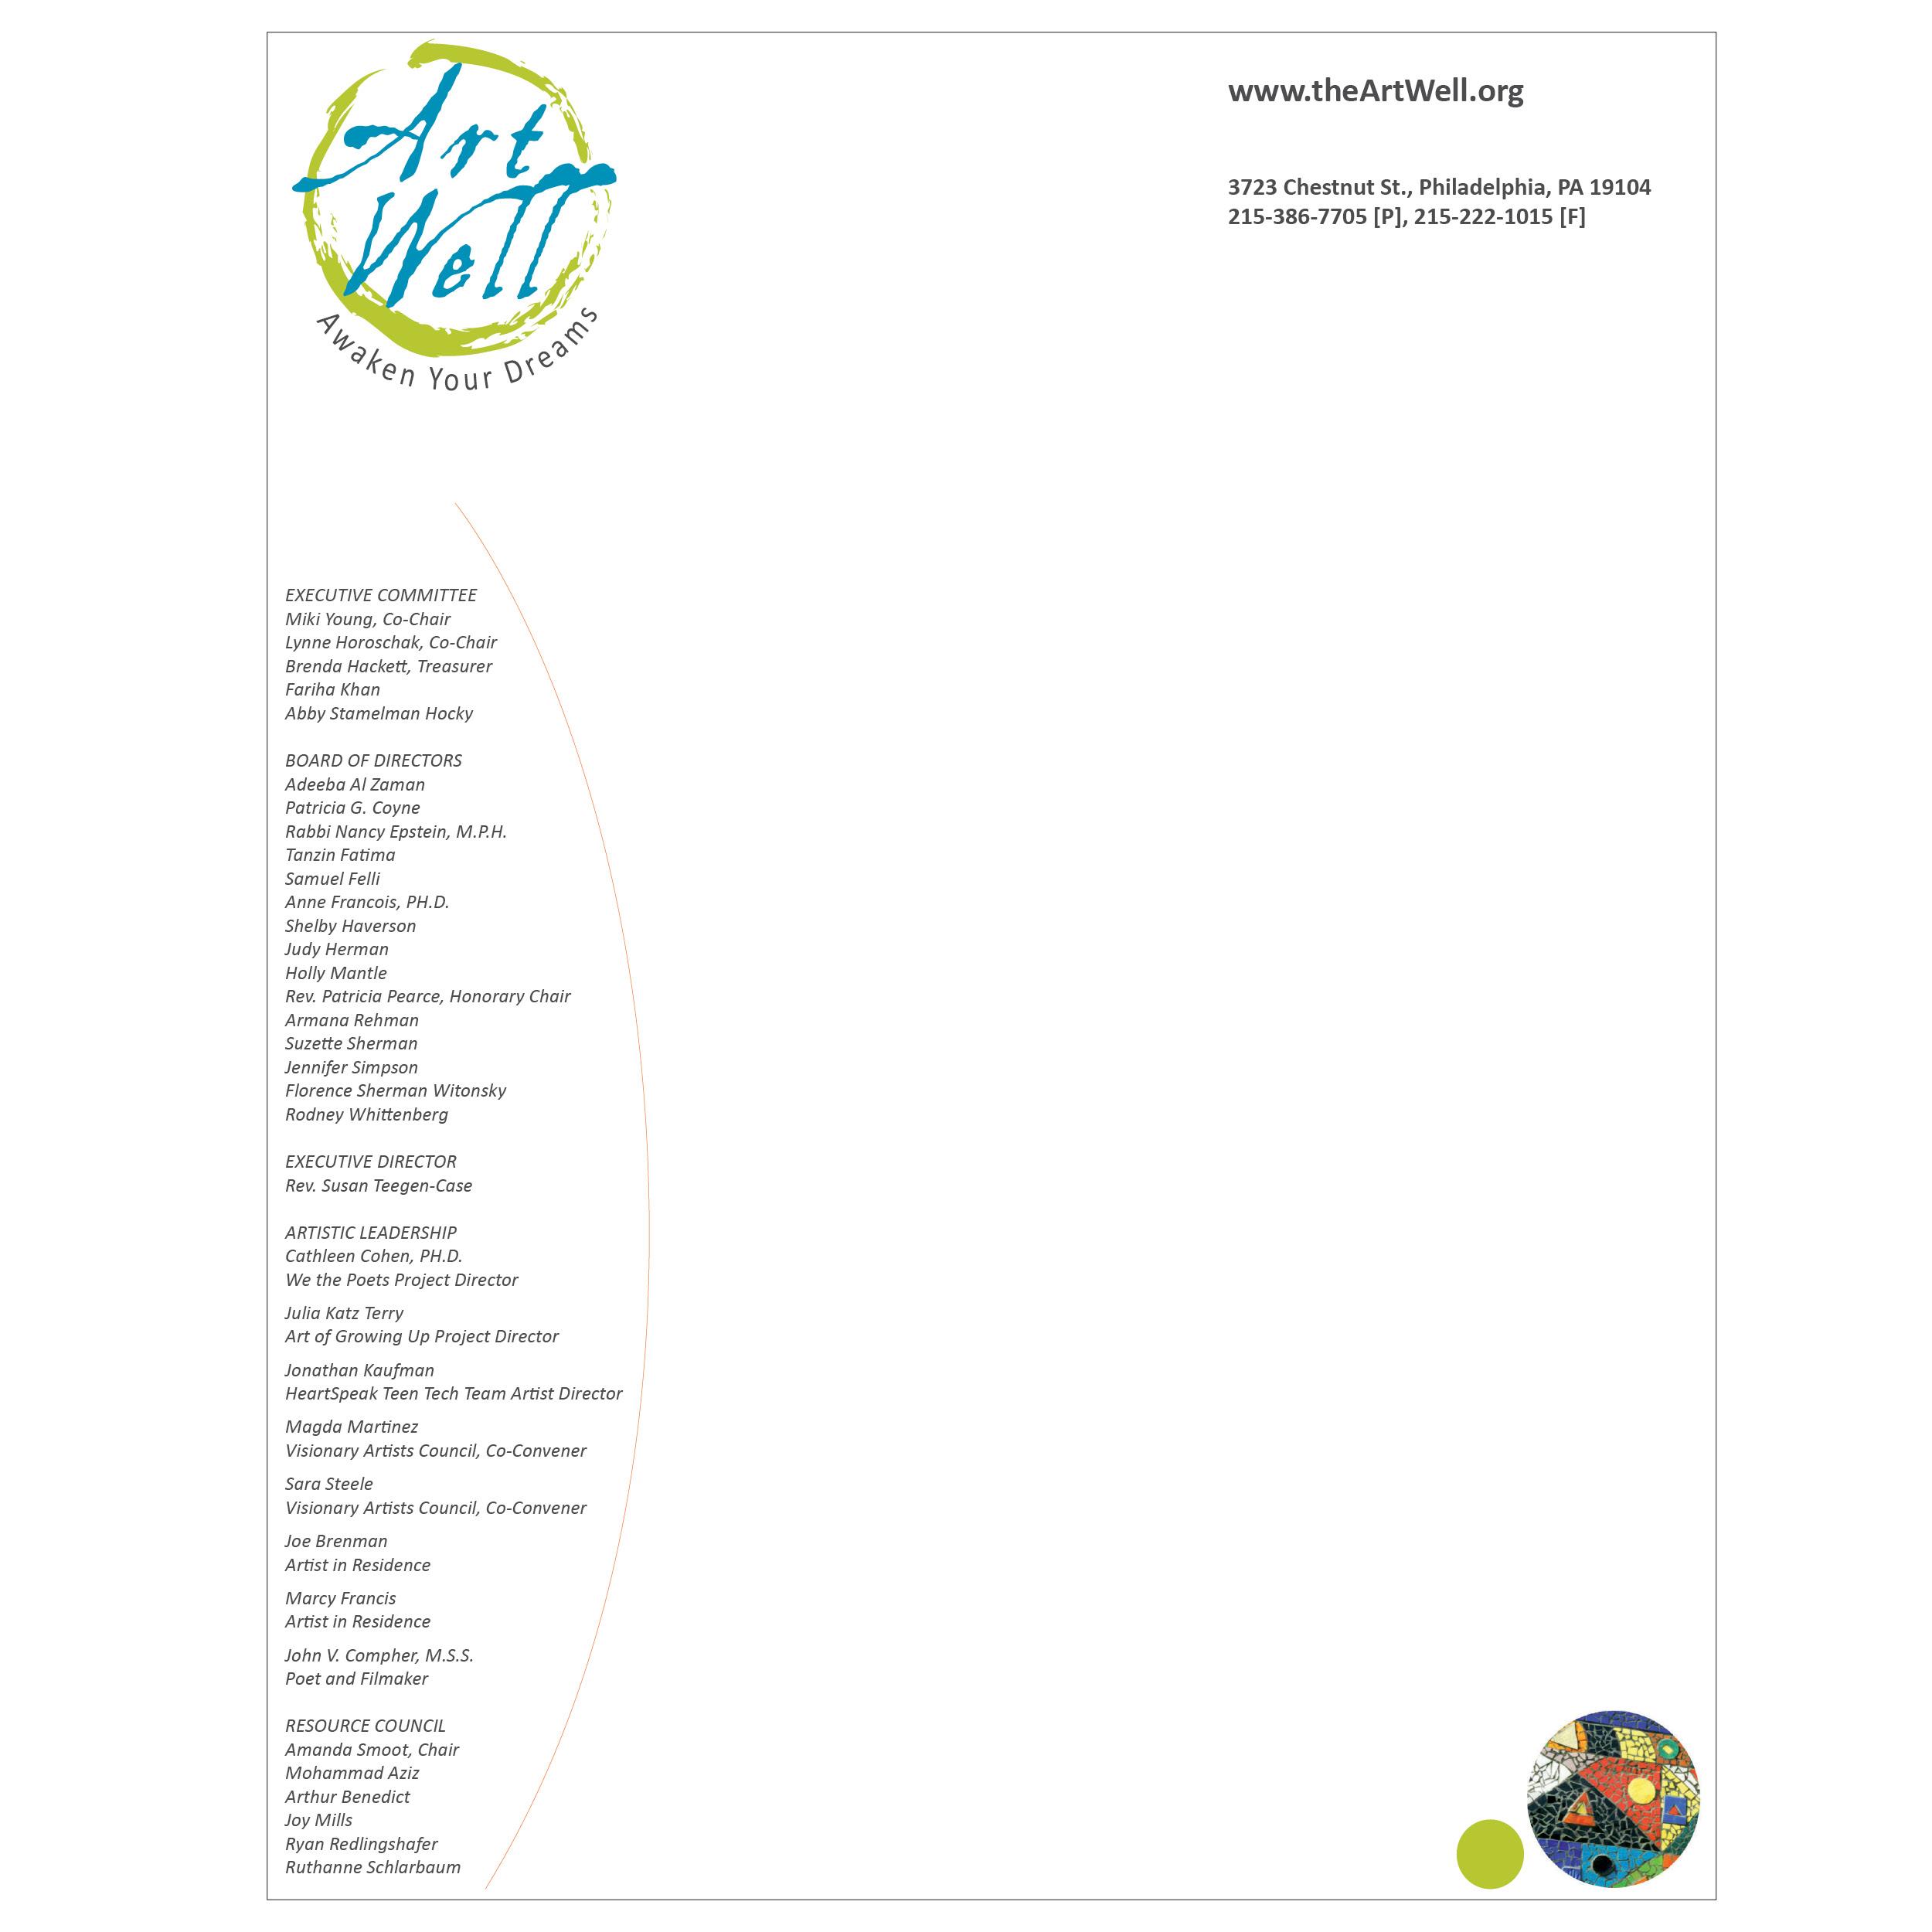 ArtWell letterhead